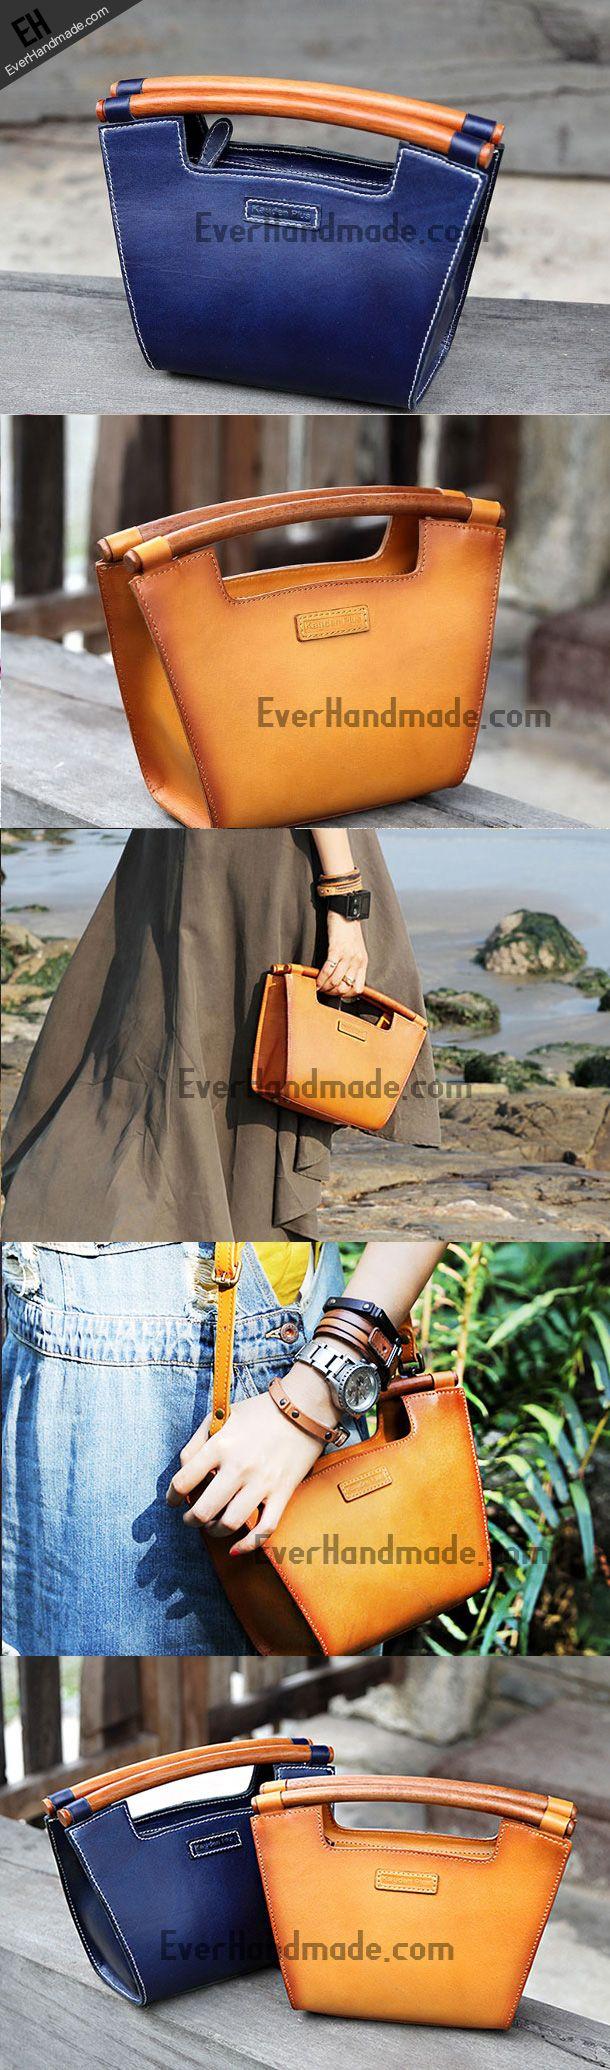 Handmade handbag purse leather crossbody bag purse shoulder bag